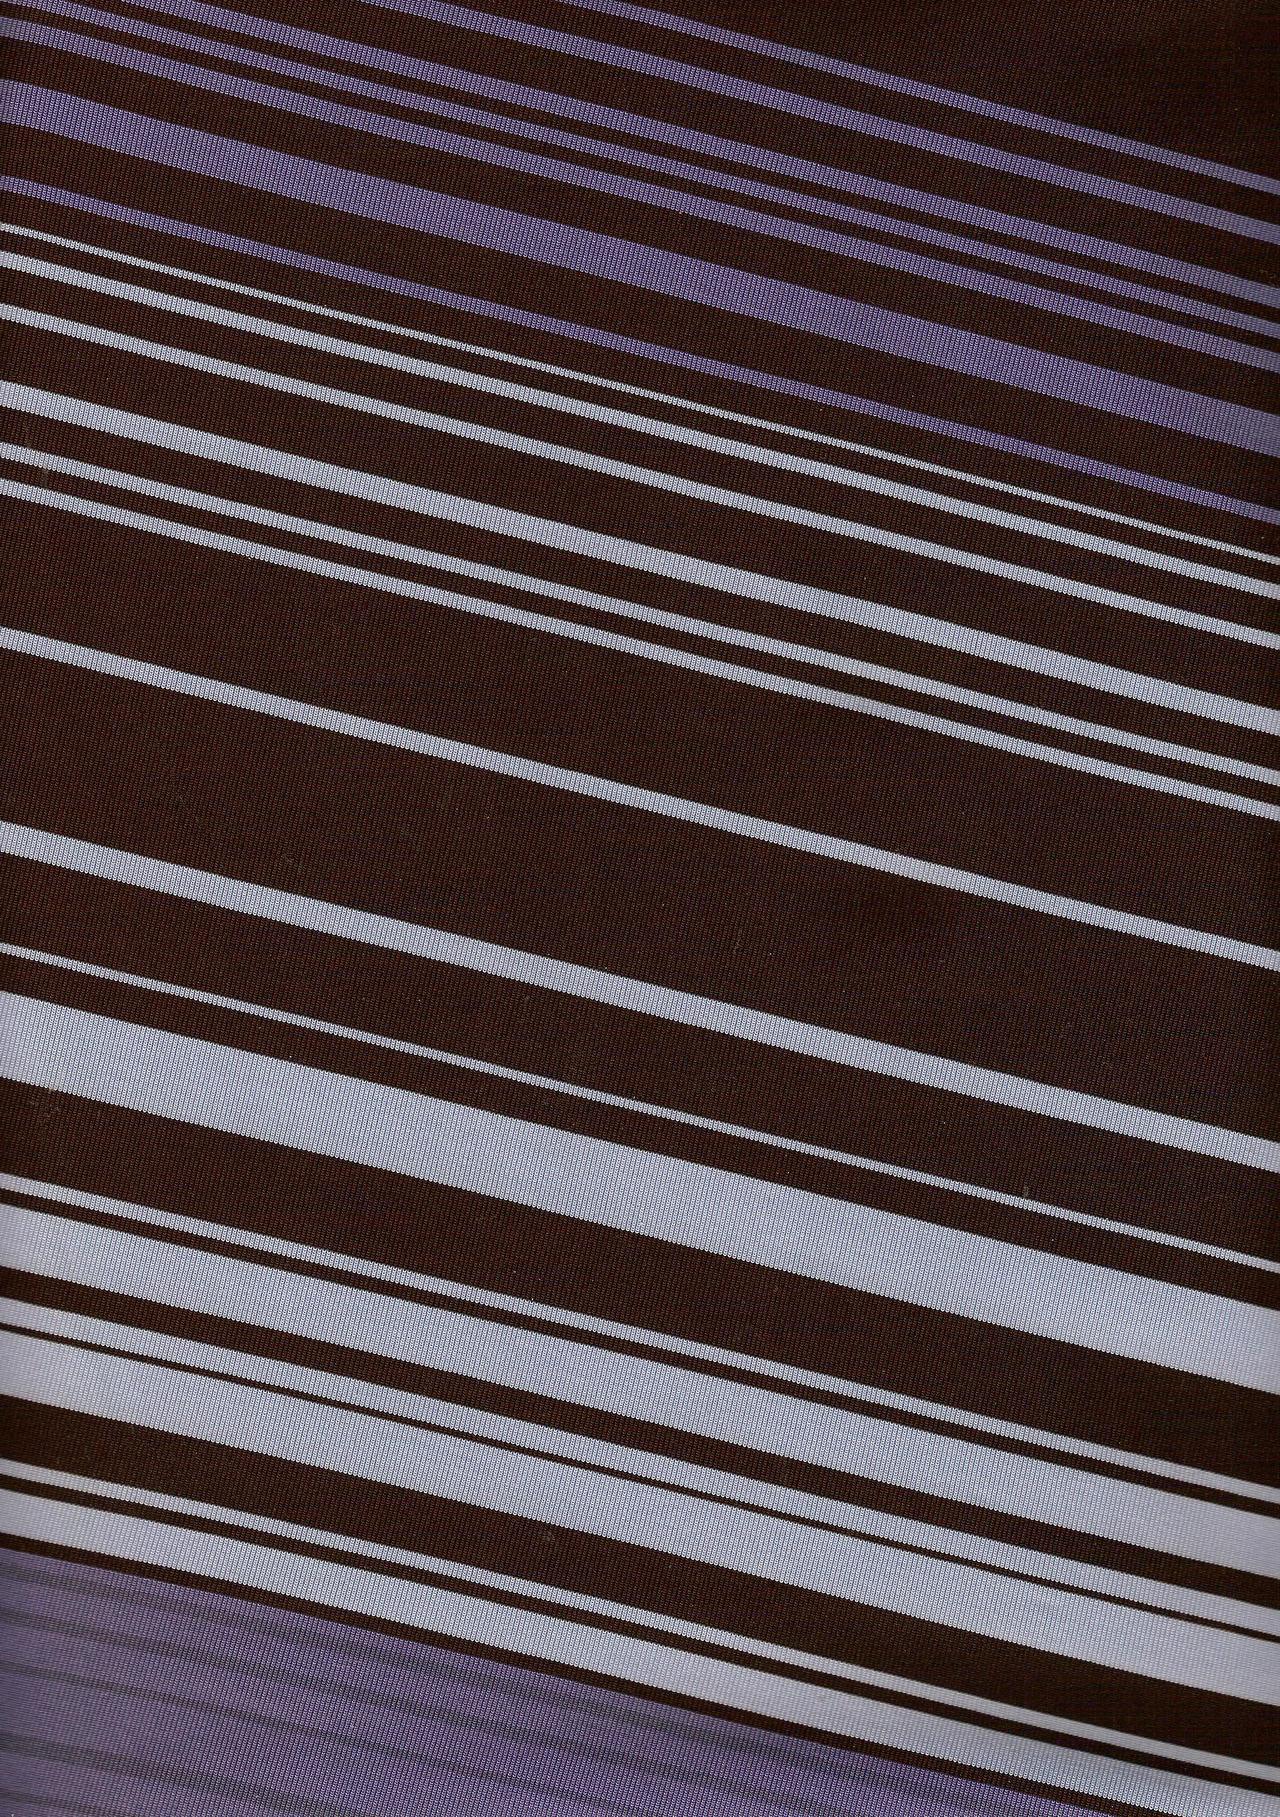 Blue Black Stripes Texture